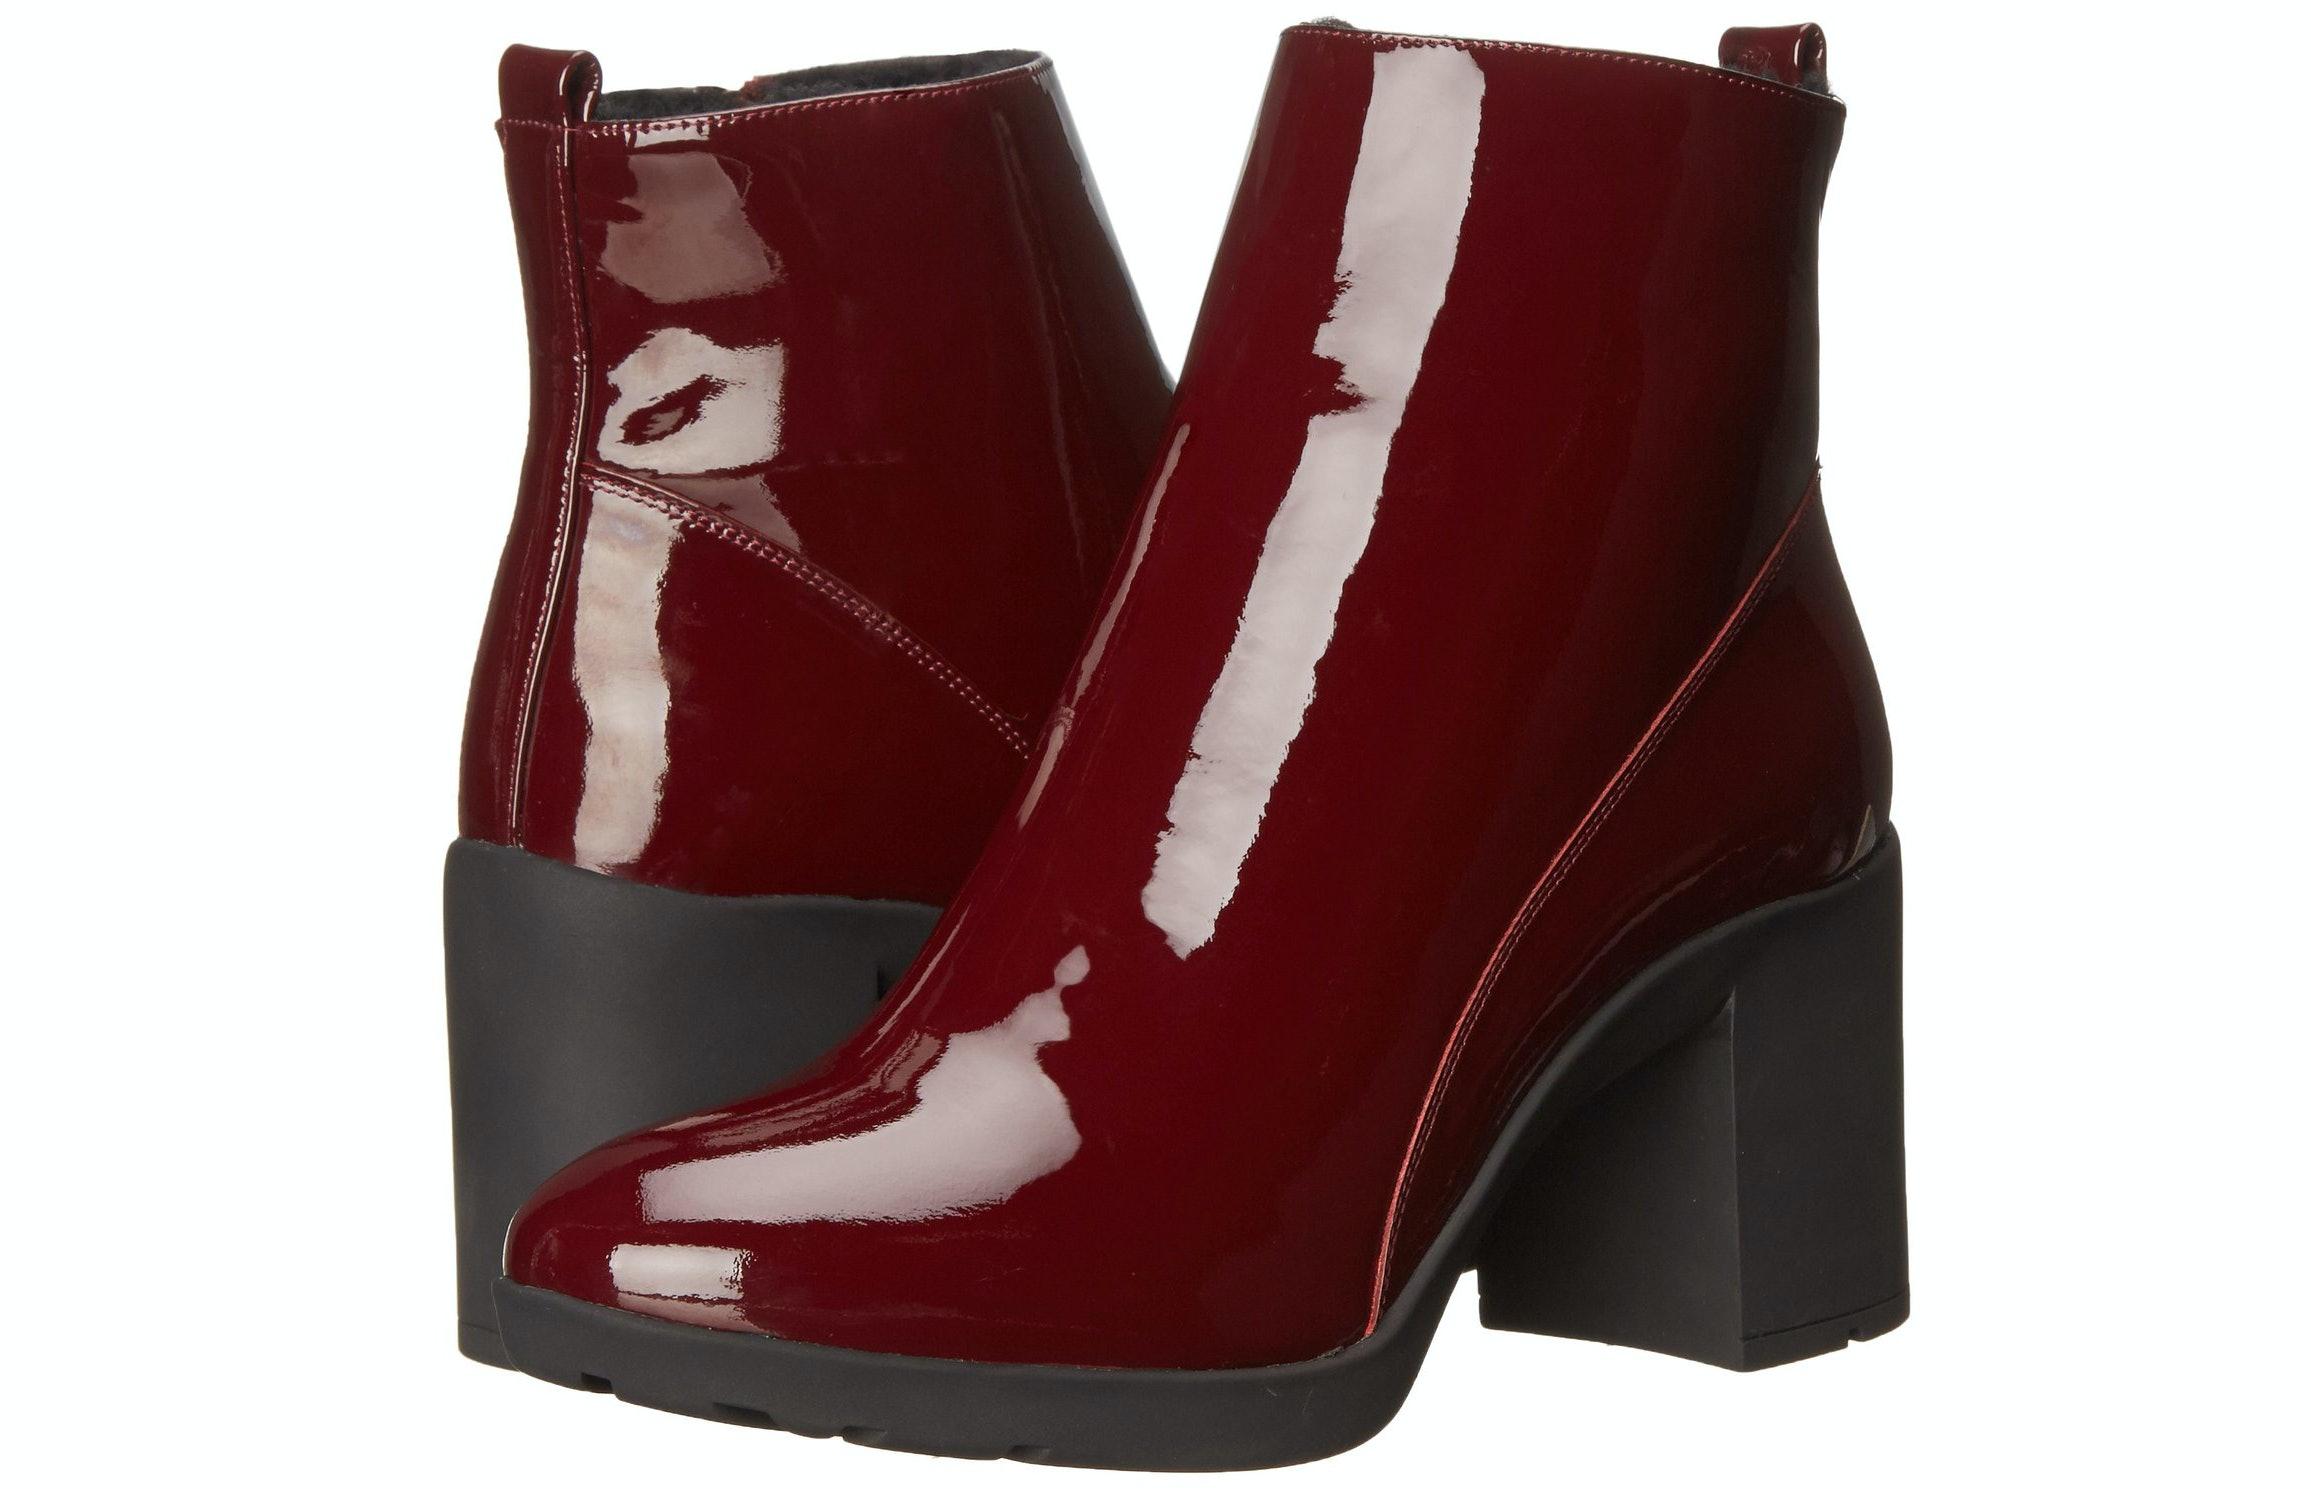 9 Heeled Rain Boots That'll Keep Your